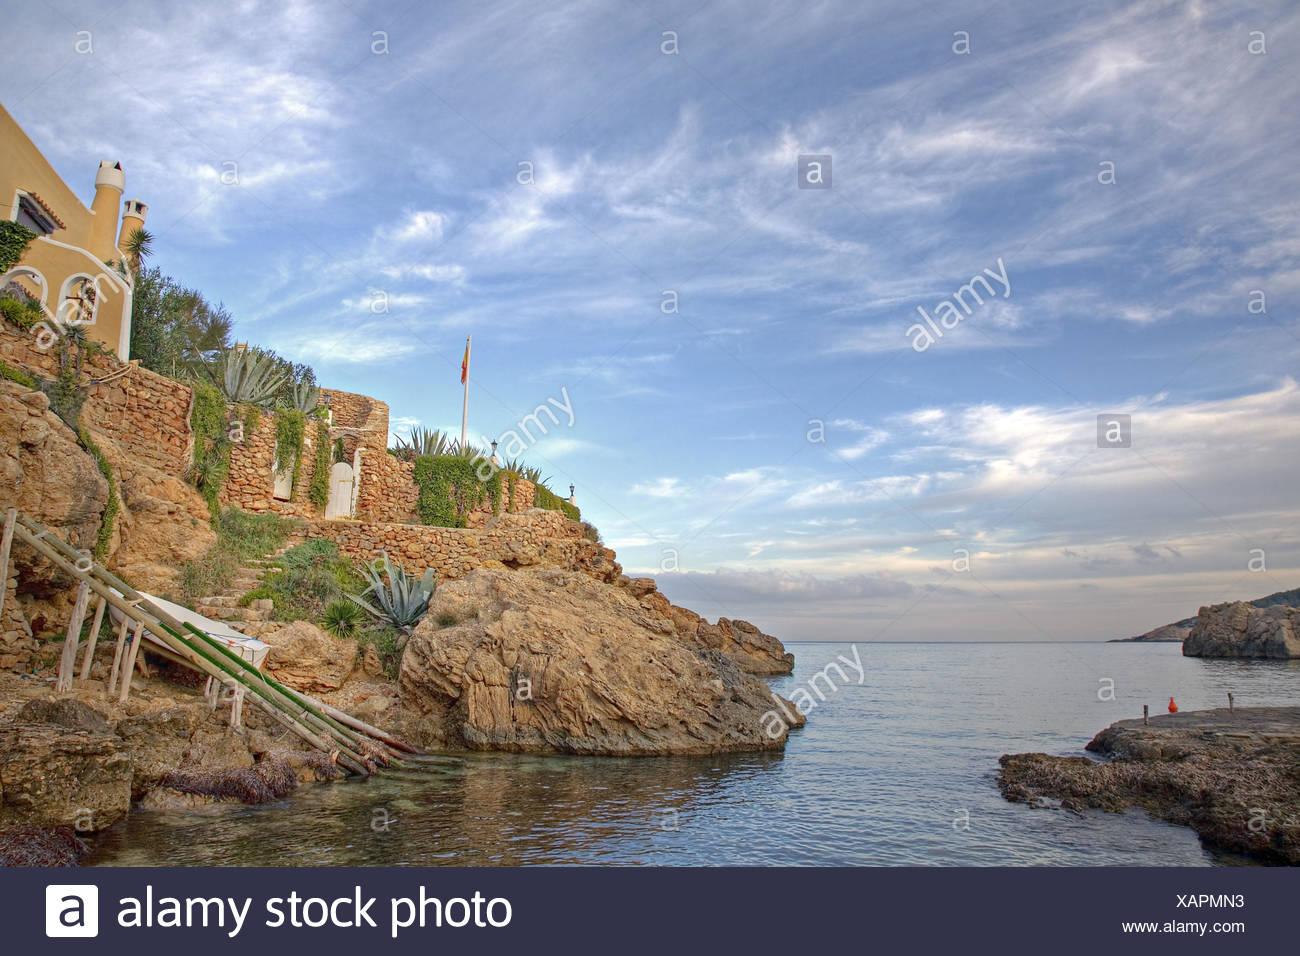 Spain, the Balearic Islands, Ibiza, bile coast, house, - Stock Image